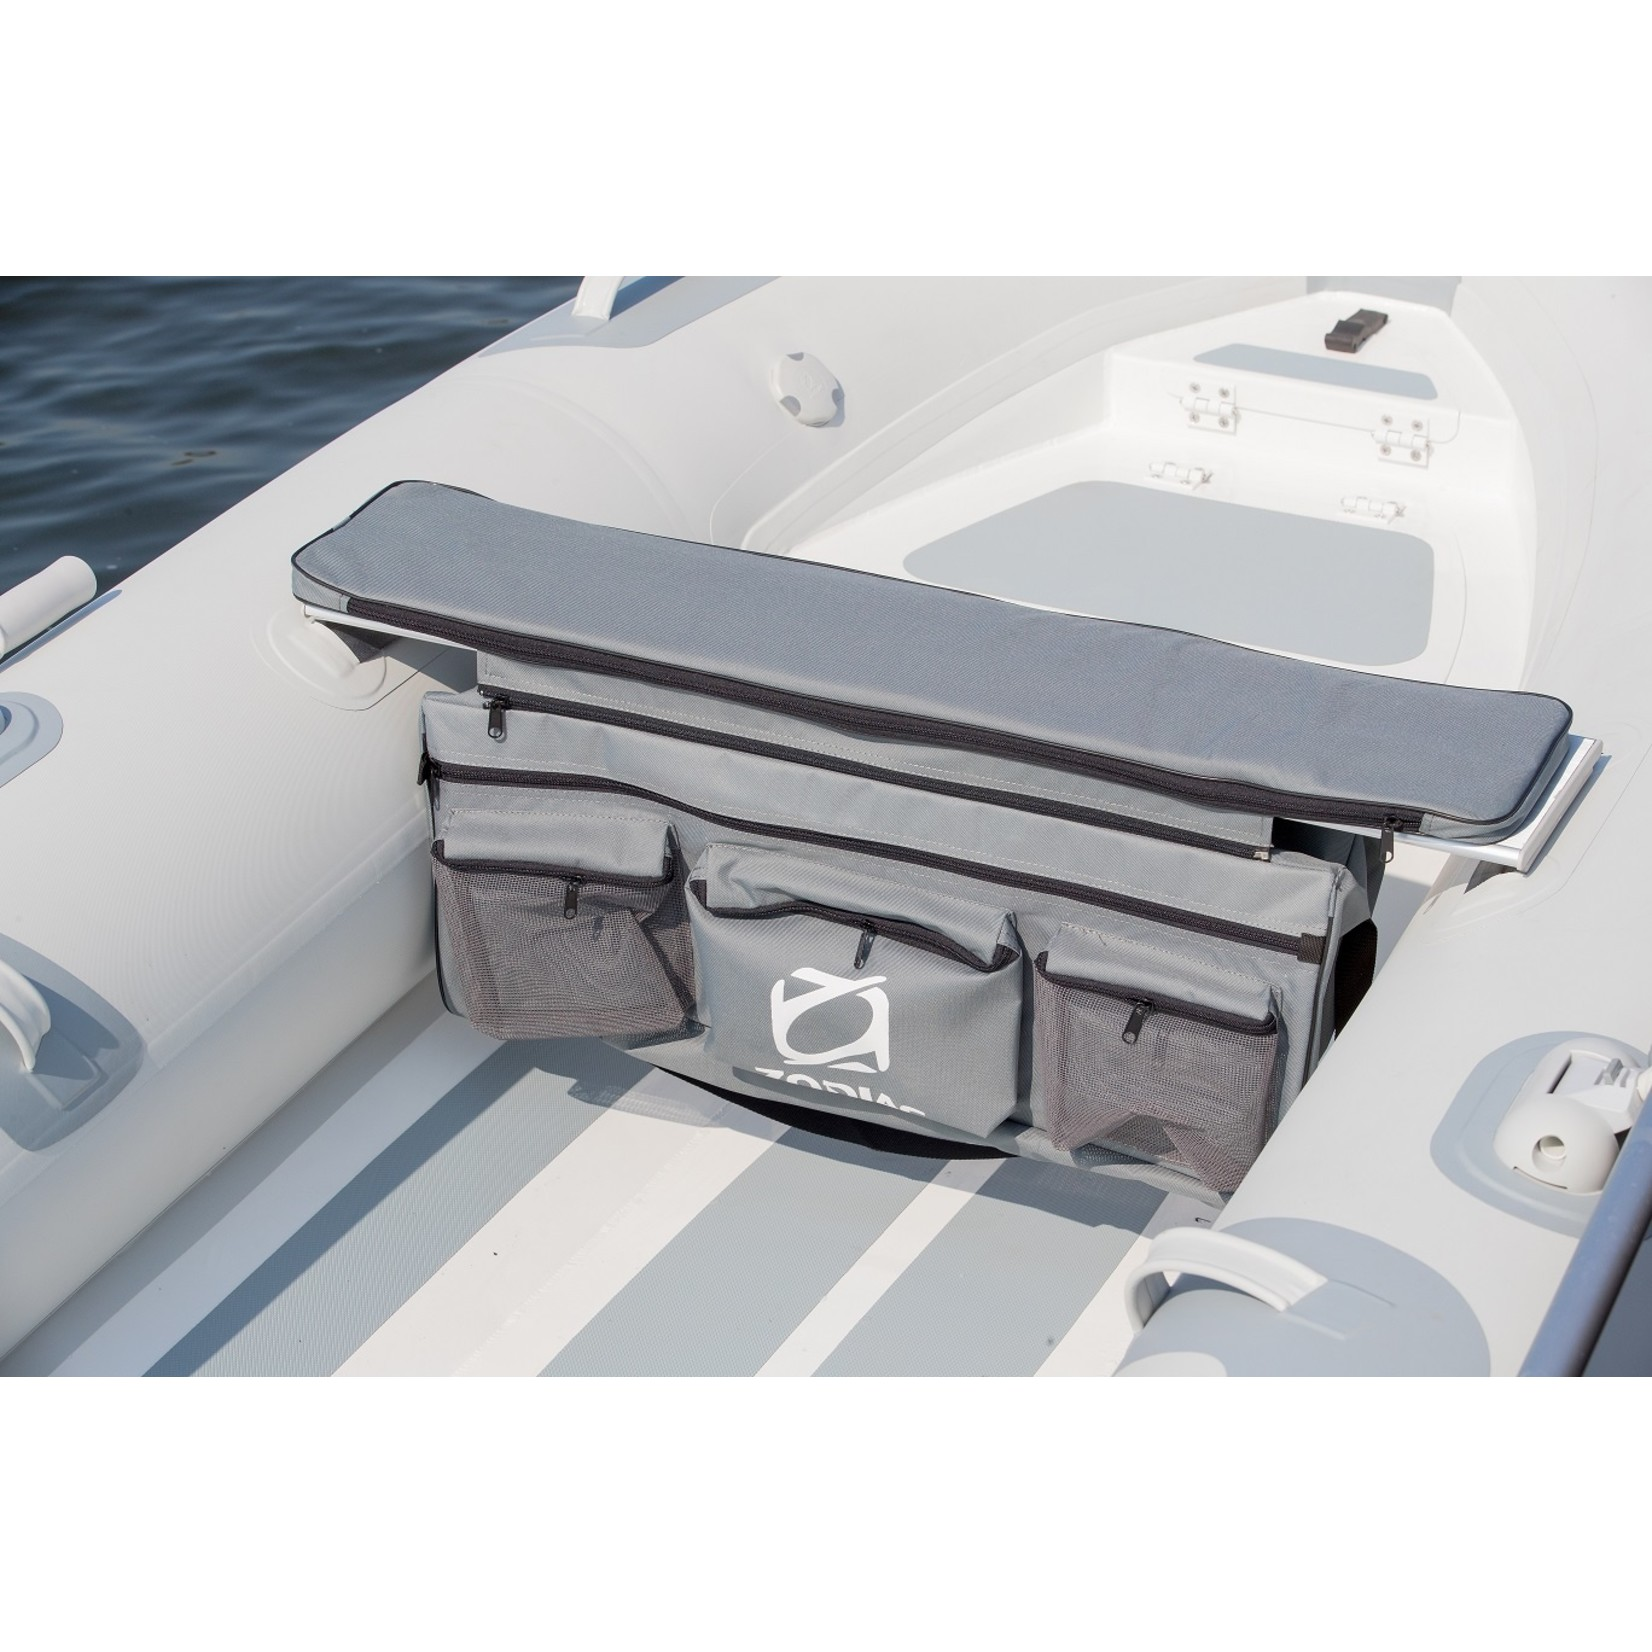 Zodiac Cadet 330 DL ALU RIB - Deck & Locker